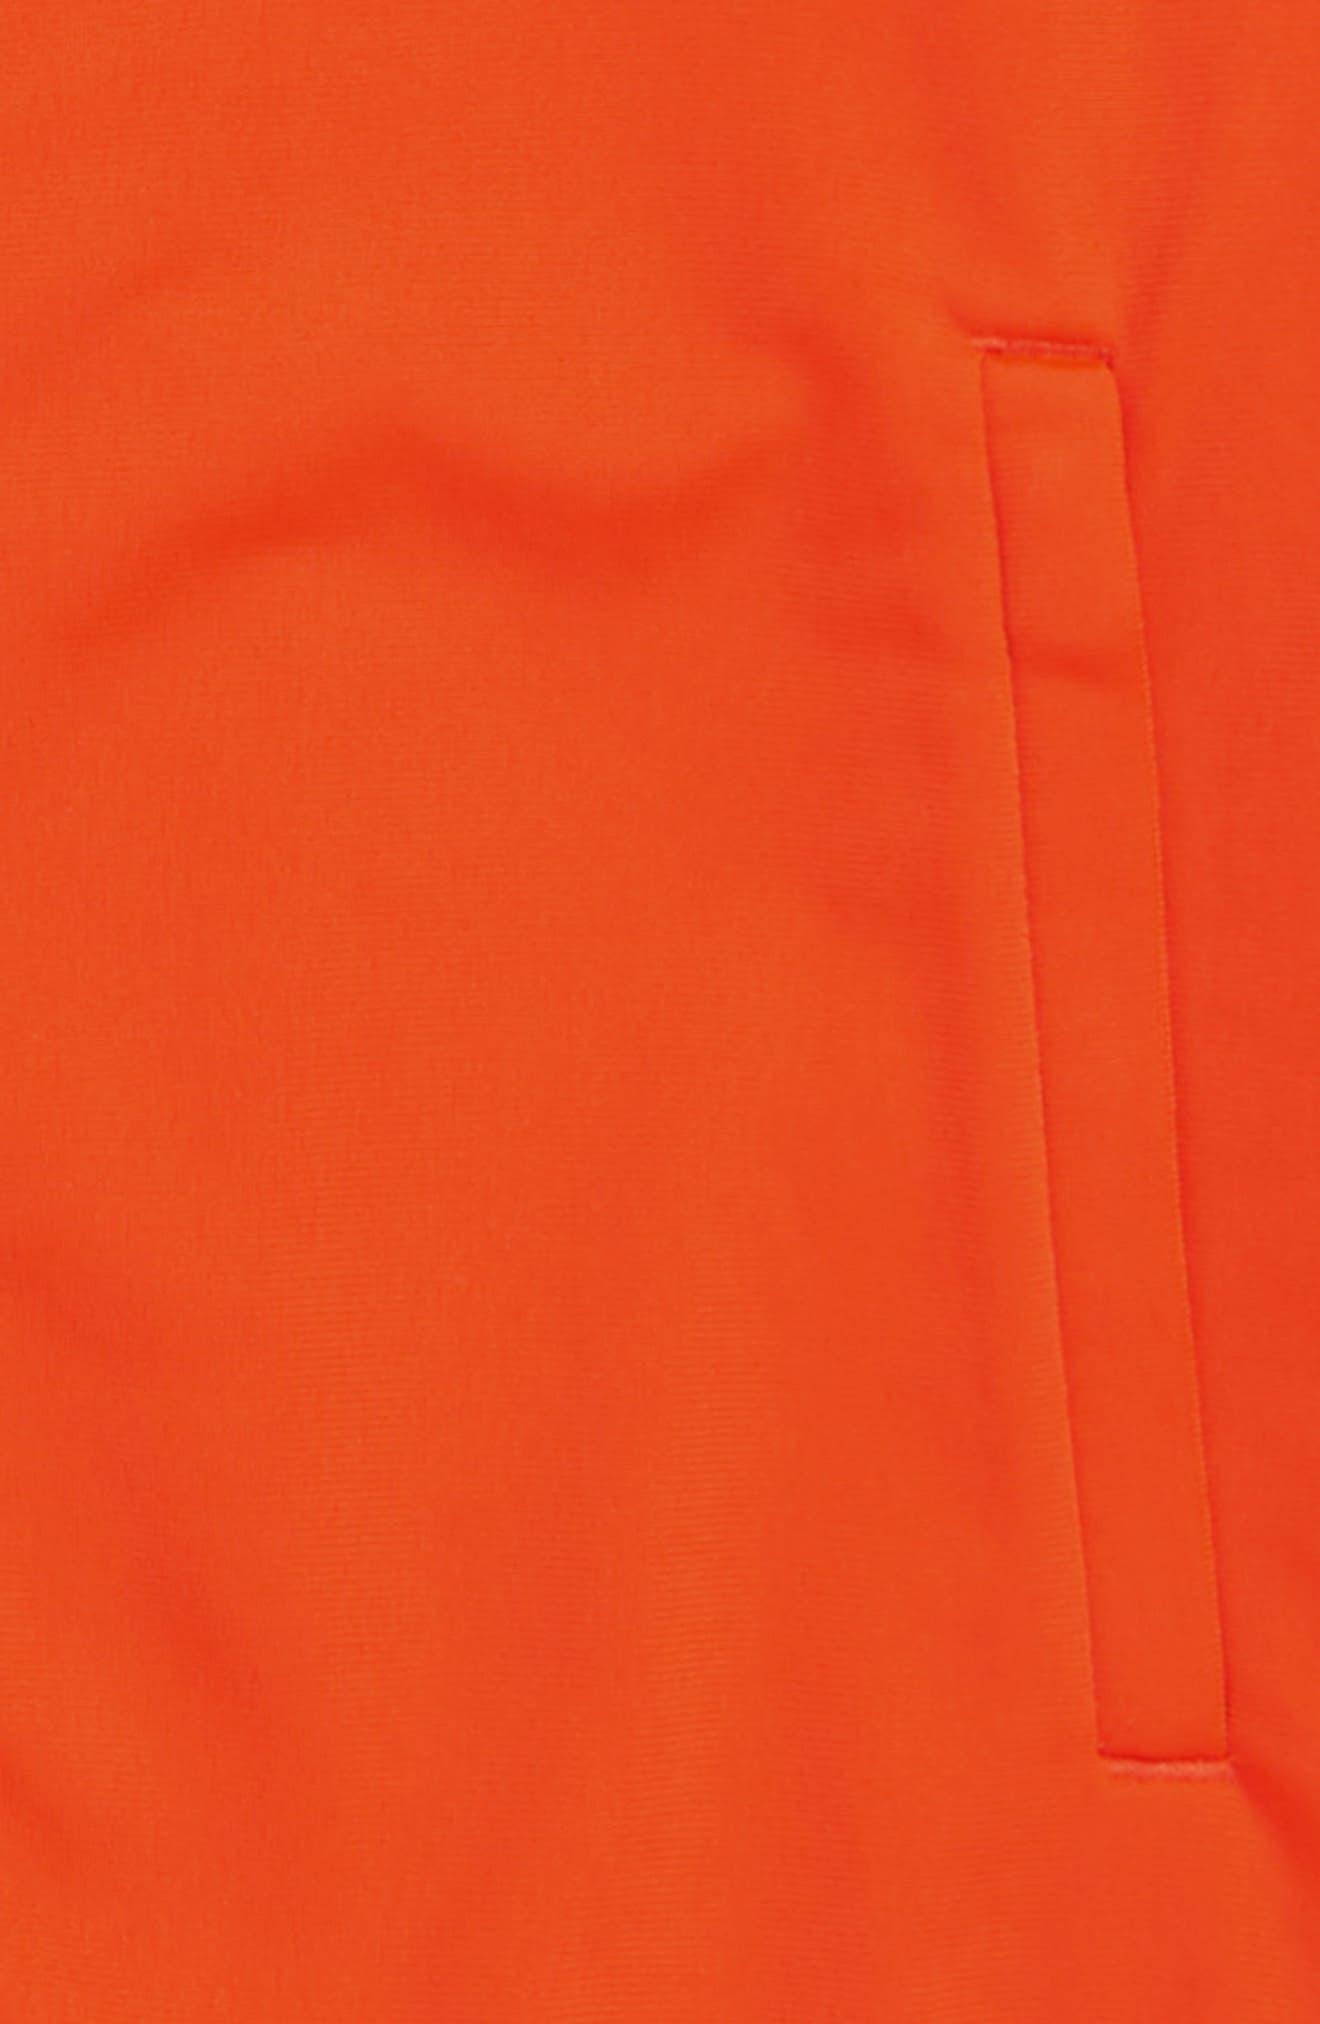 Superstar Track Jacket,                             Alternate thumbnail 2, color,                             ACTIVE ORANGE/ WHITE